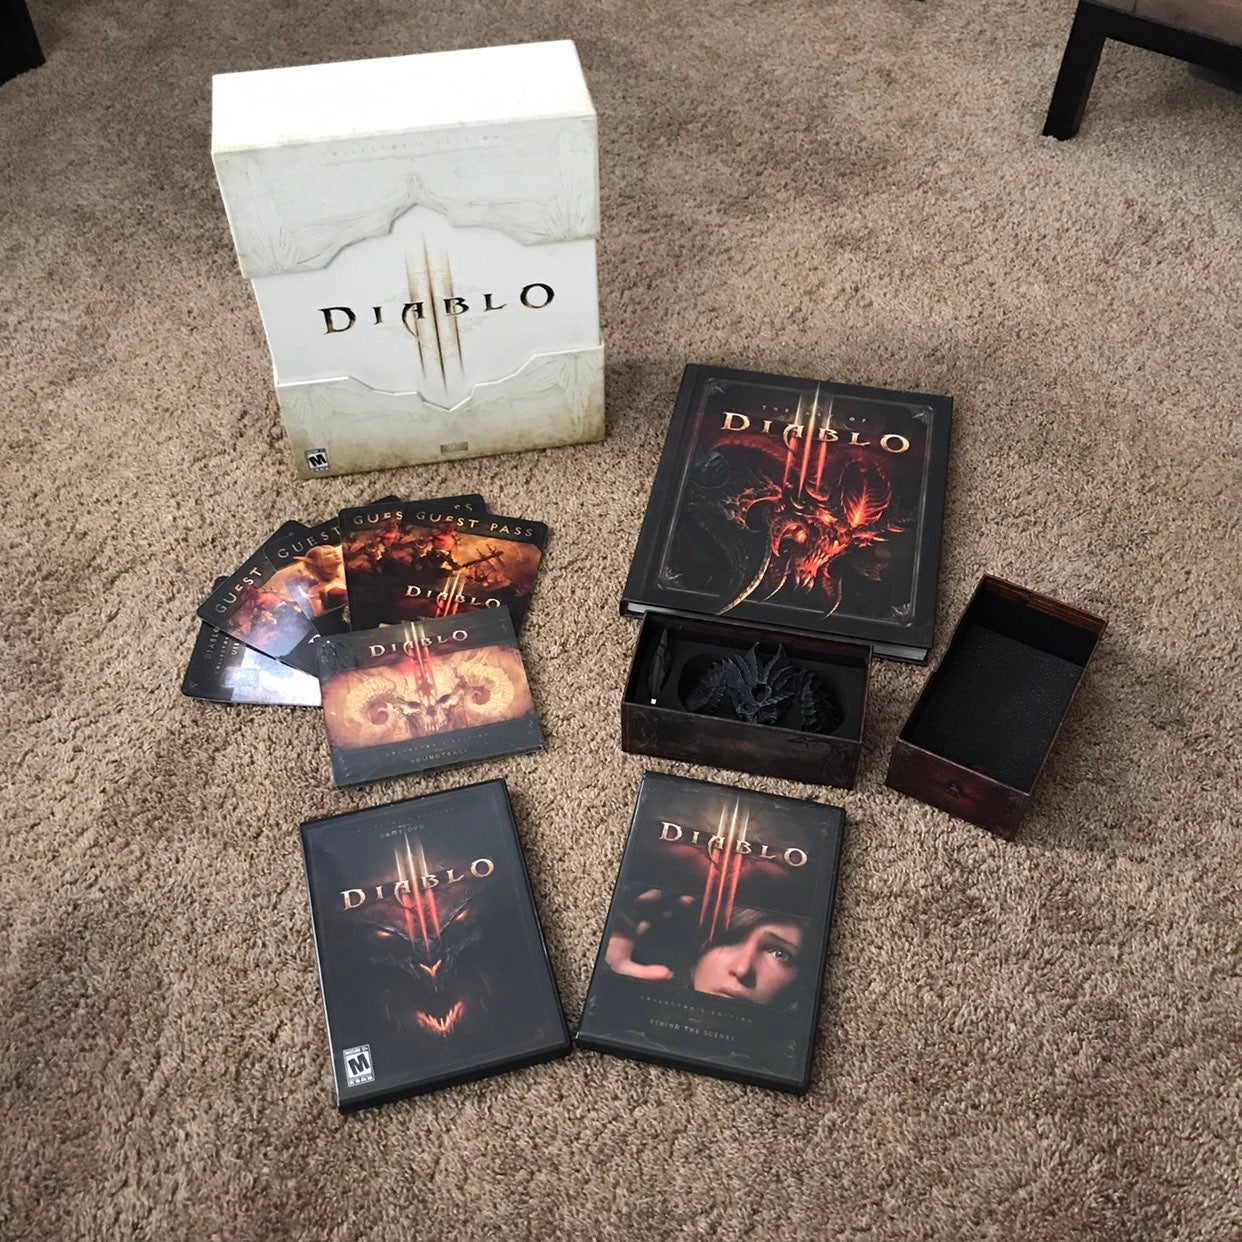 Diablo 3 PC Collectors Editin Box Set